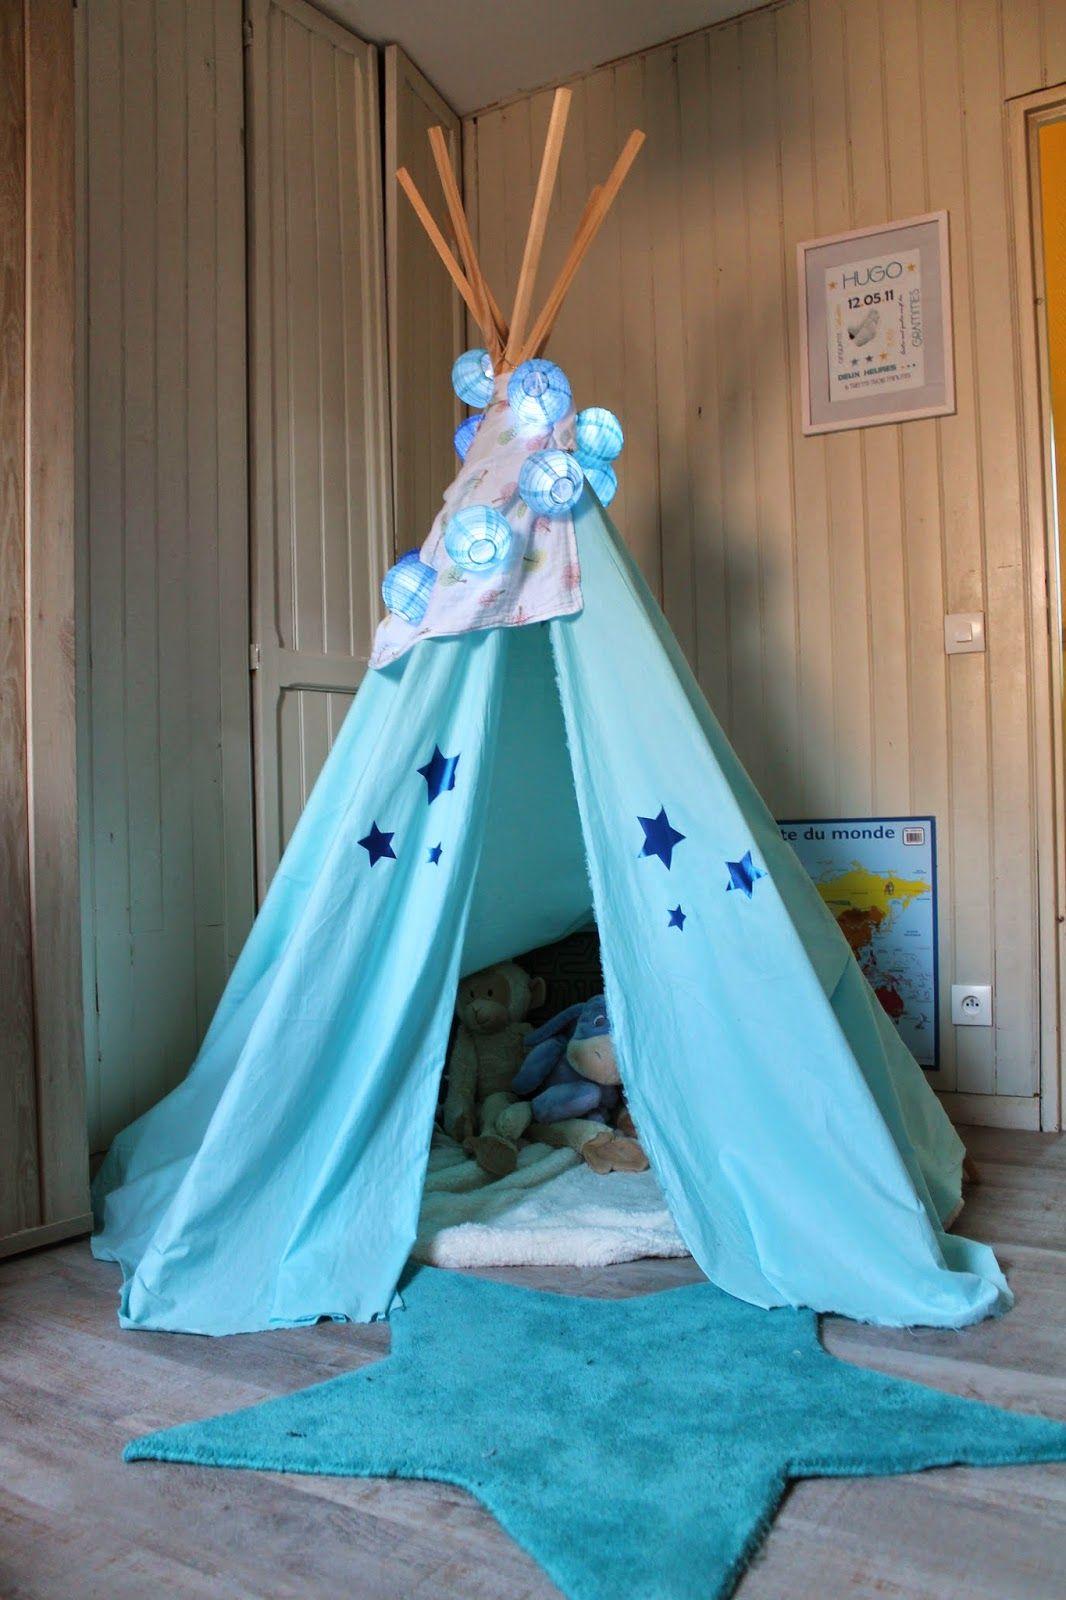 joli tipi bleu diy tipi chambre enfant chambre et enfant. Black Bedroom Furniture Sets. Home Design Ideas